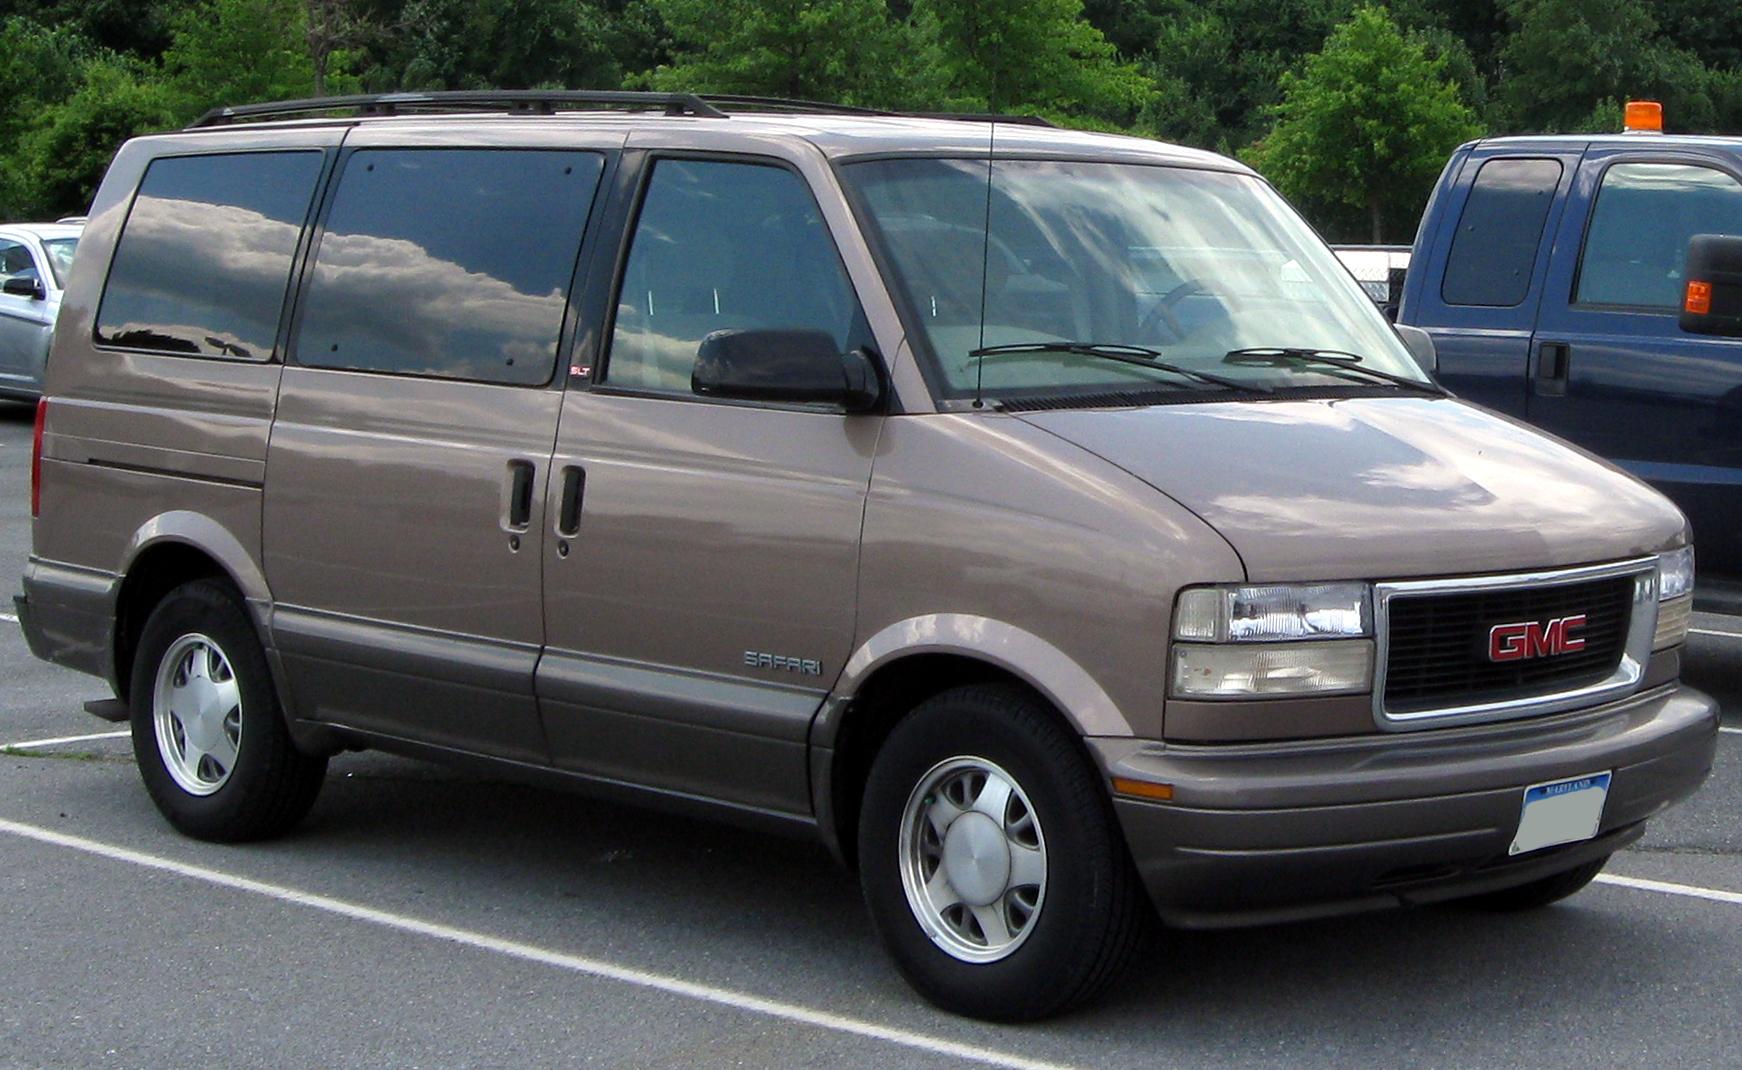 Used 2011 Chevrolet Silverado 1500 Features amp Specs  Edmunds